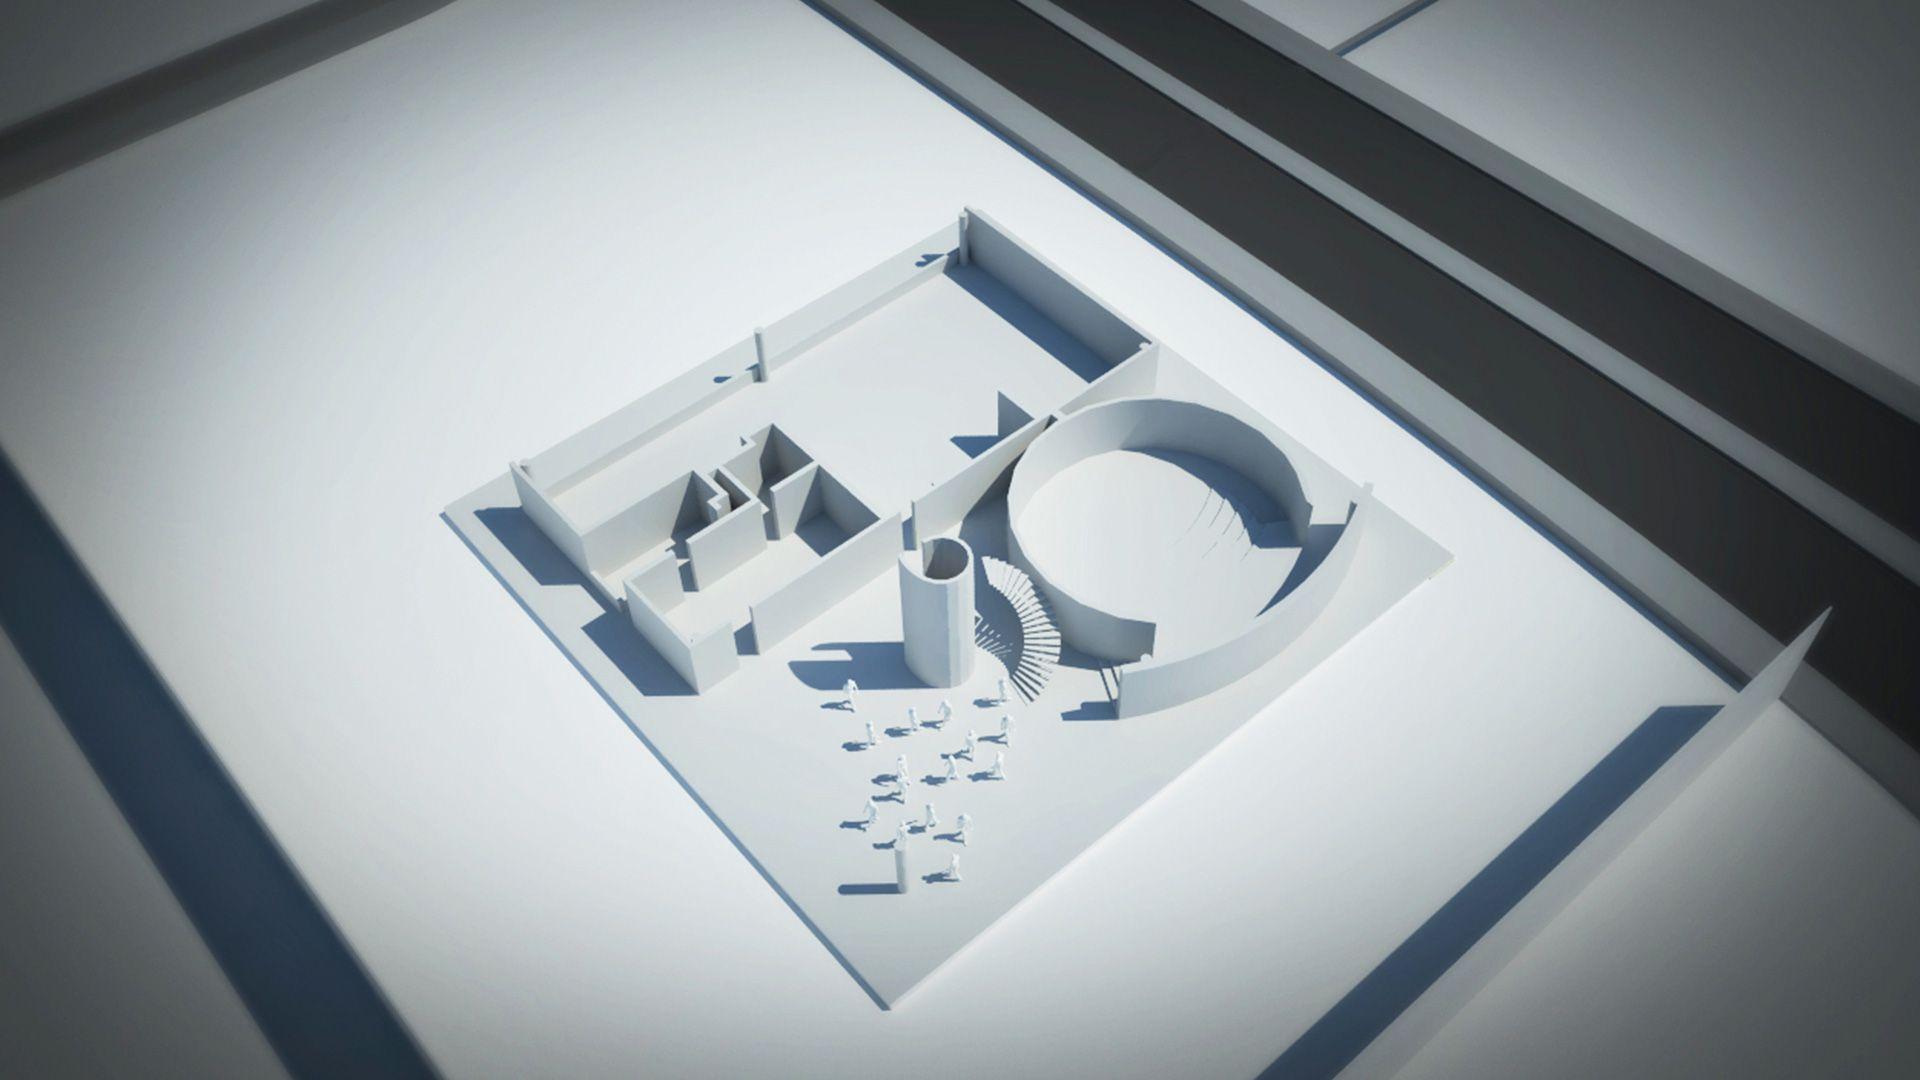 midiateca-santo-andre-render-layout-terreo-existente